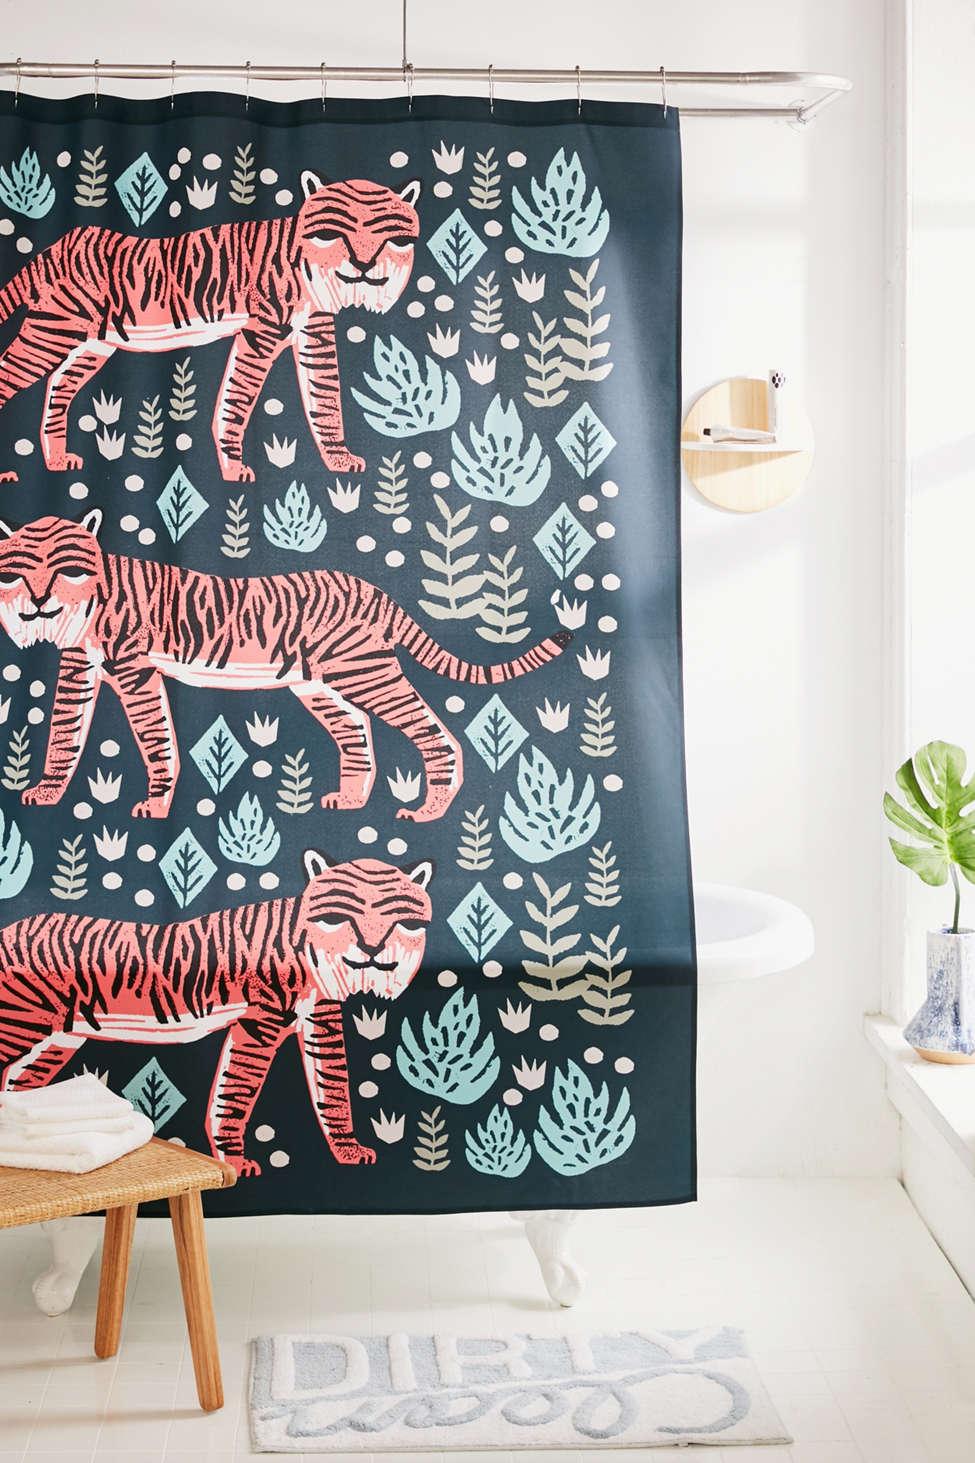 Slide View: 1: Andrea Lauren For Deny Safari Tiger Shower Curtain